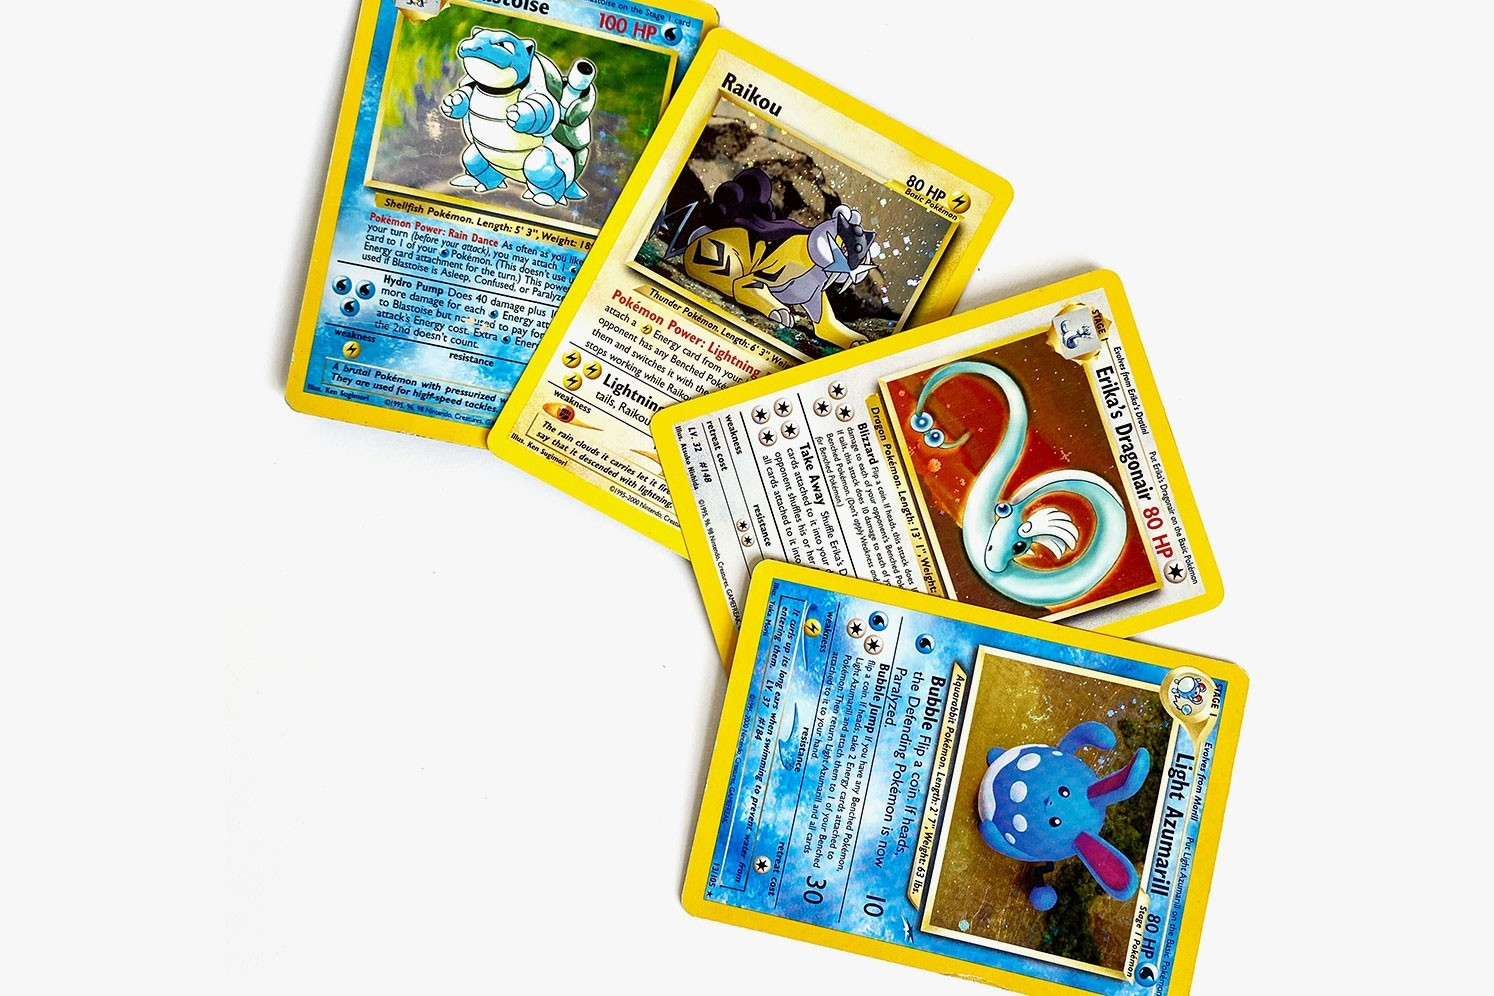 Pokémon 卡牌如何在短短 7 個月里創造出 950,000 美元的商業價值?|專訪 Logan Fournier